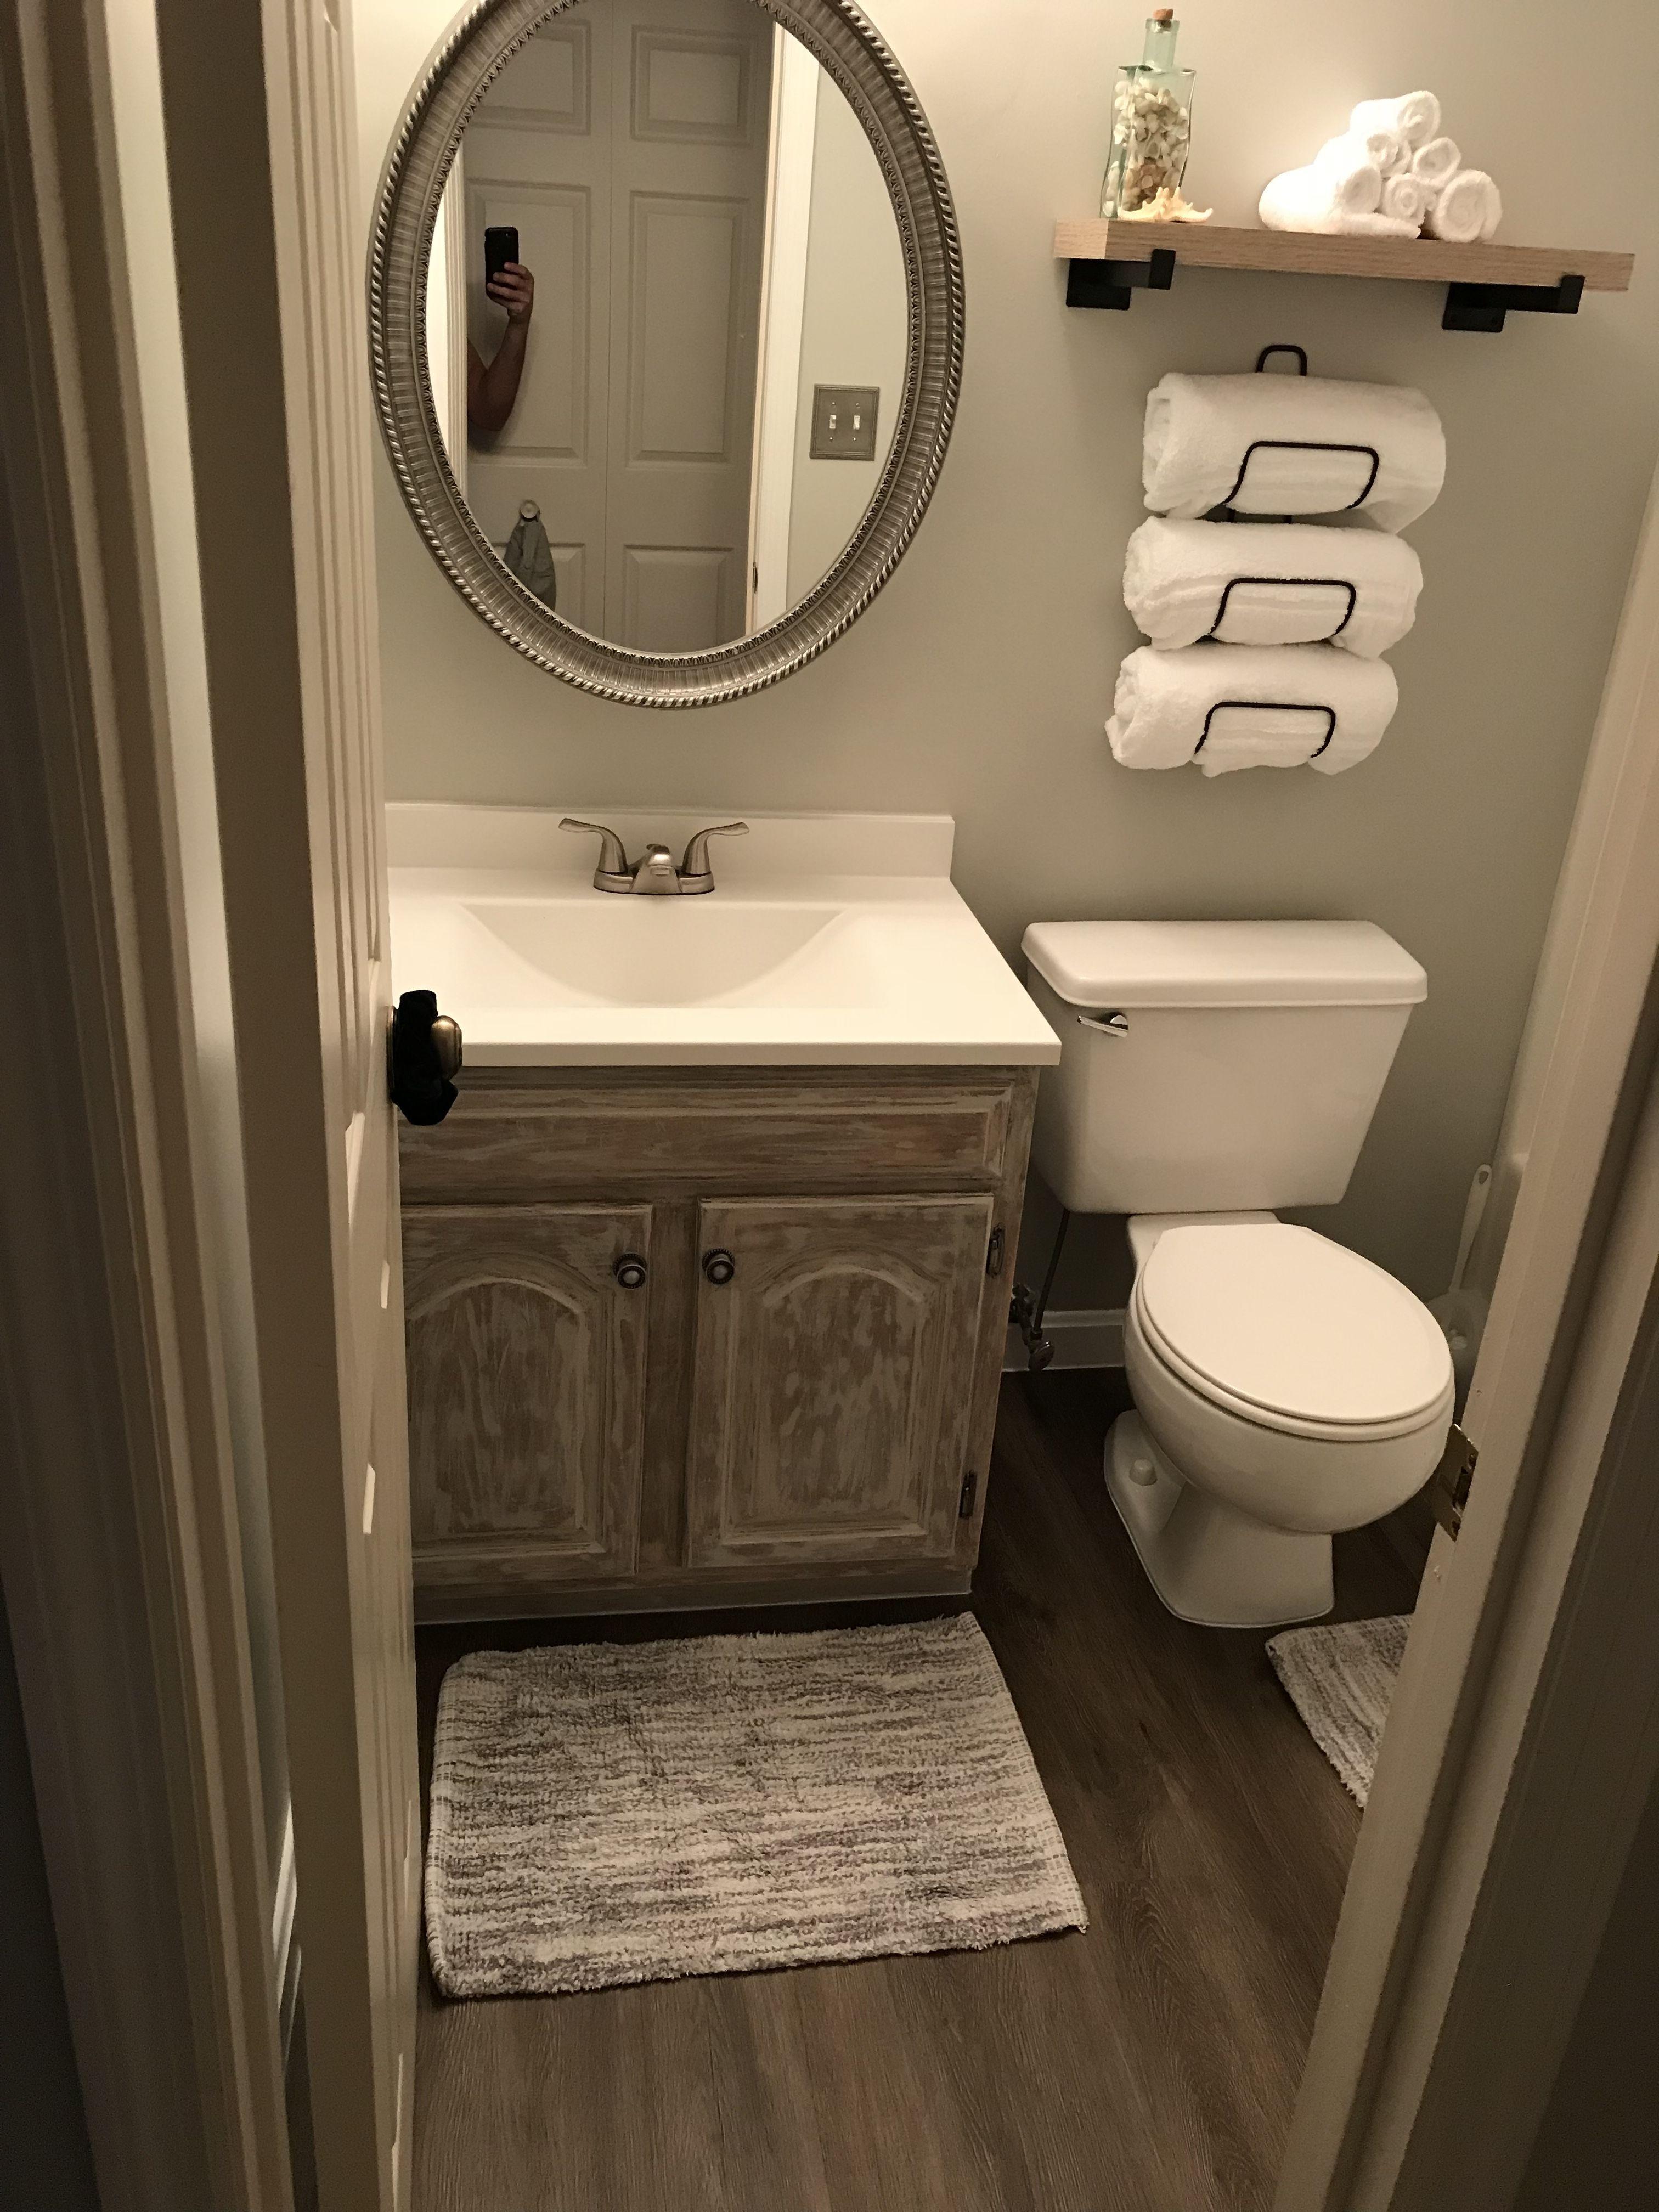 Popular Bathroom Paint Colors Small Bathroom Decor Office Bathroom Design Small Bathroom